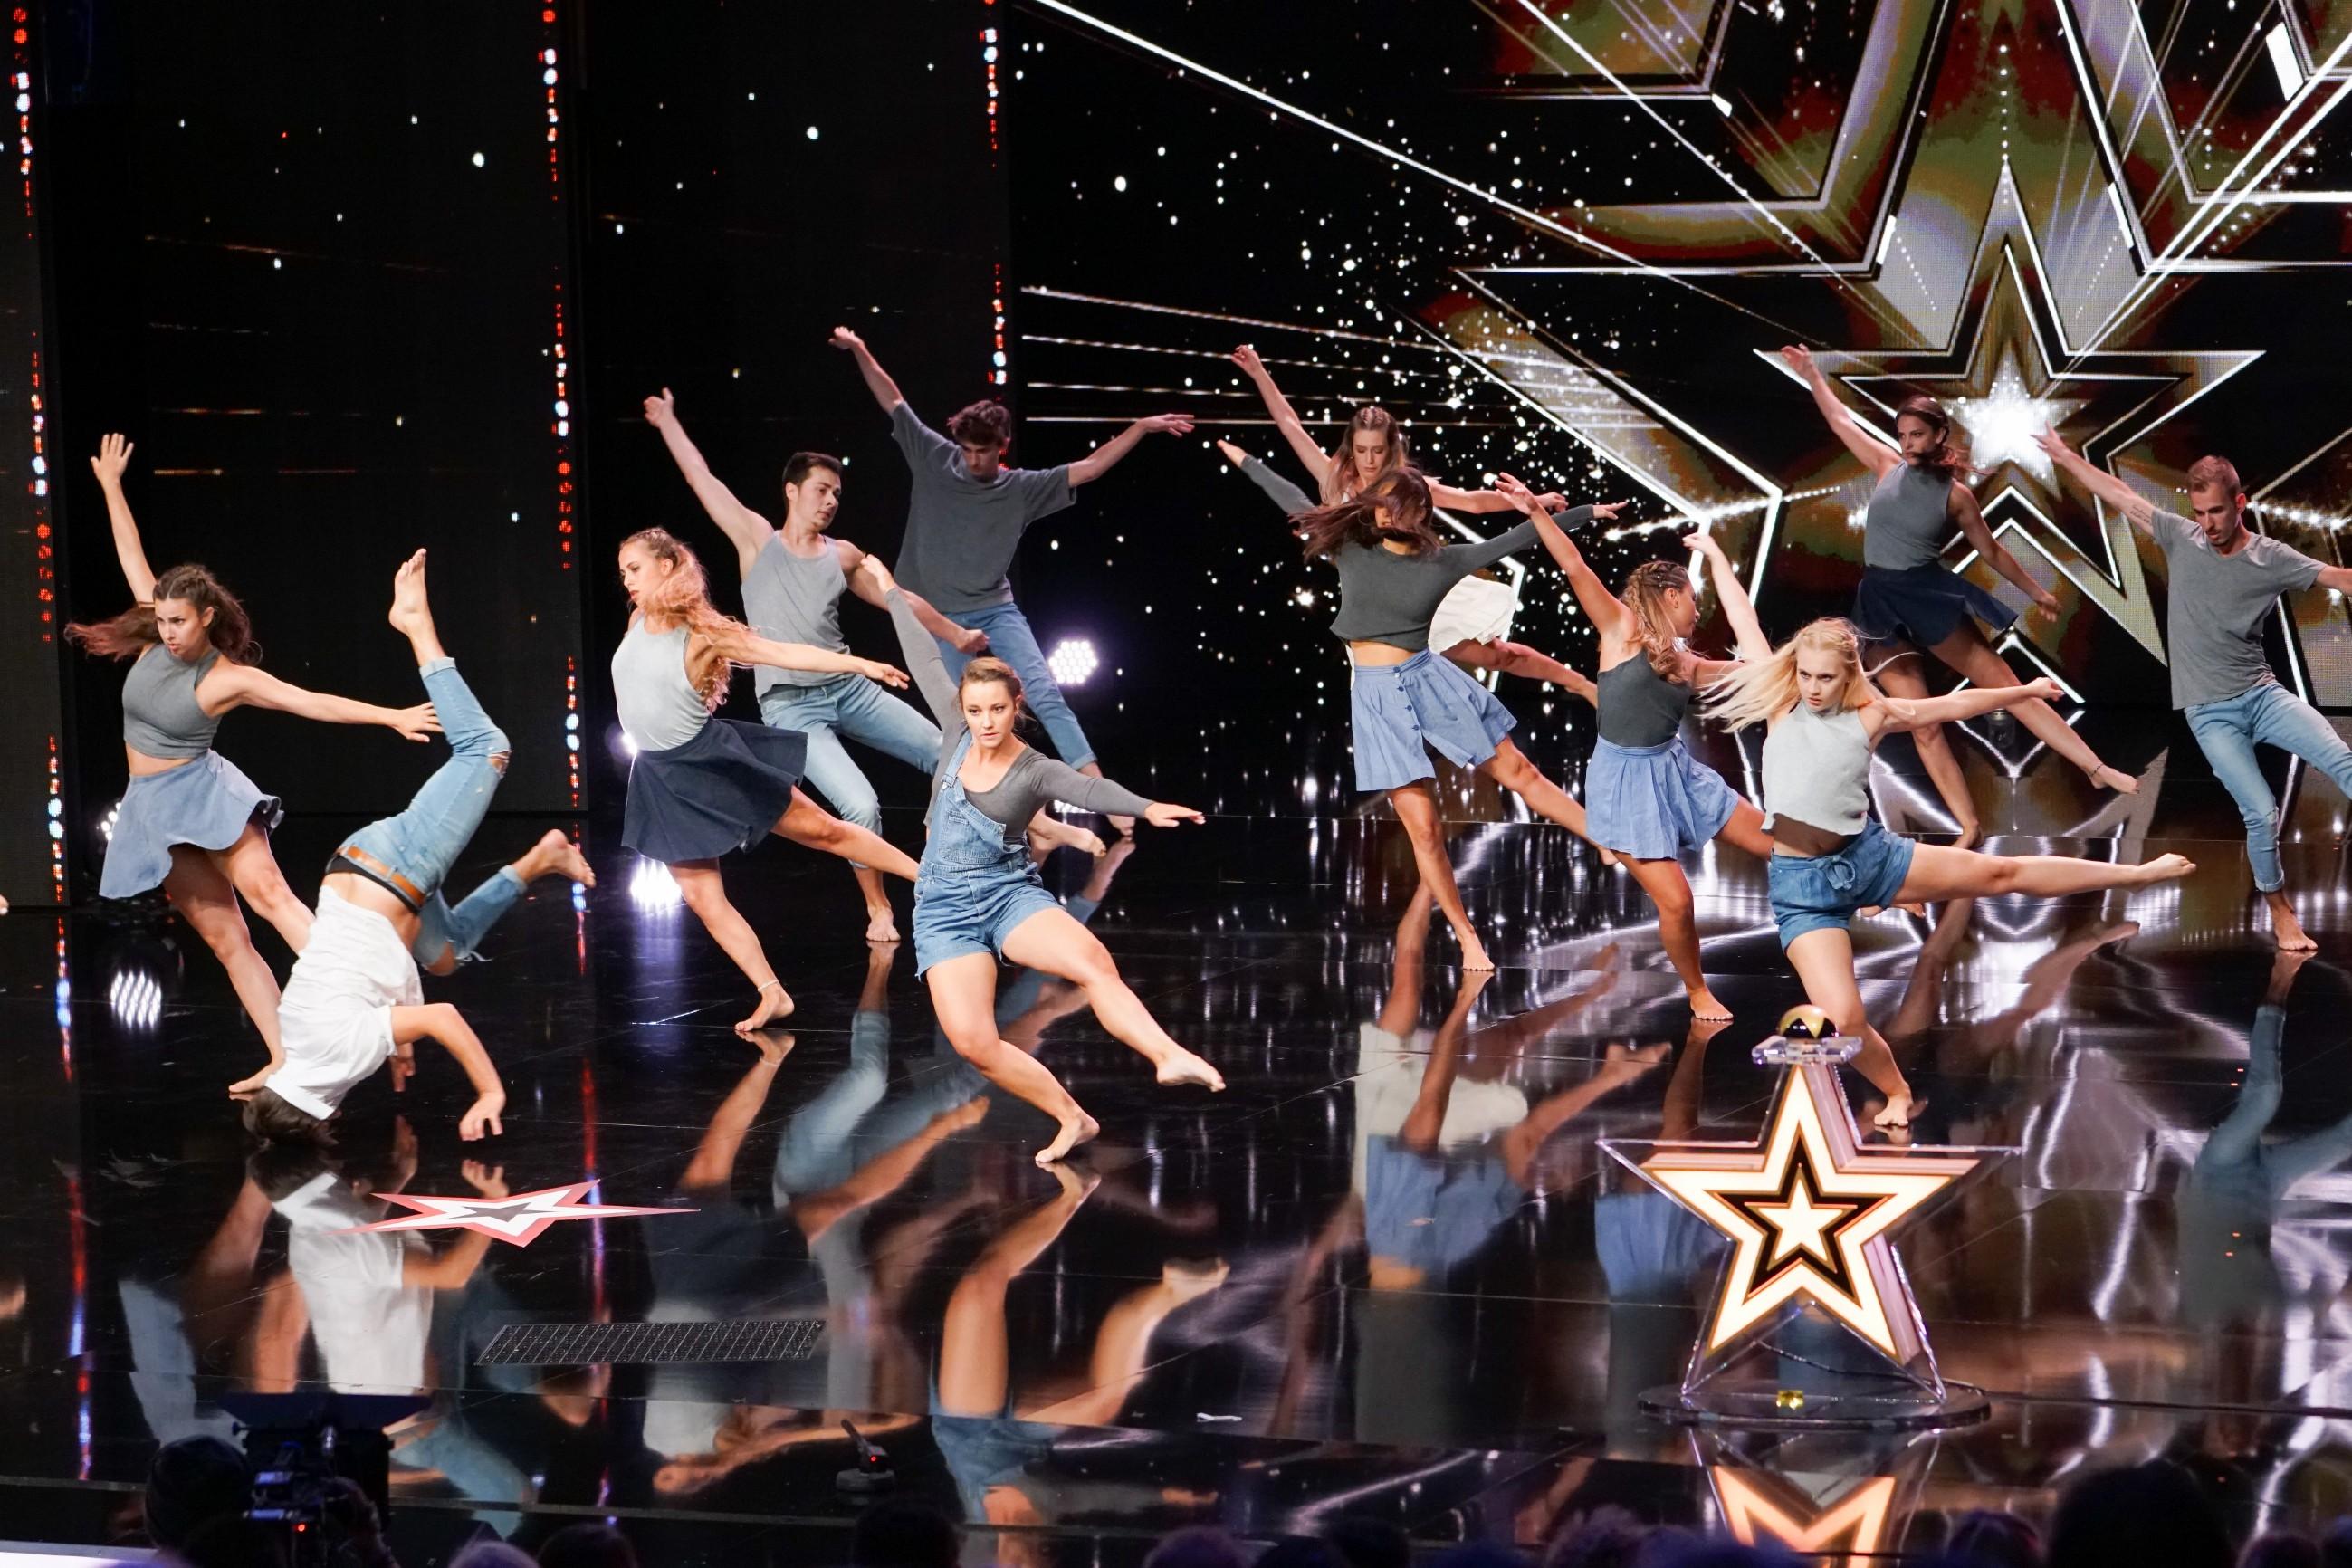 Das Supertalent 2017 Show 8 - MDC Company